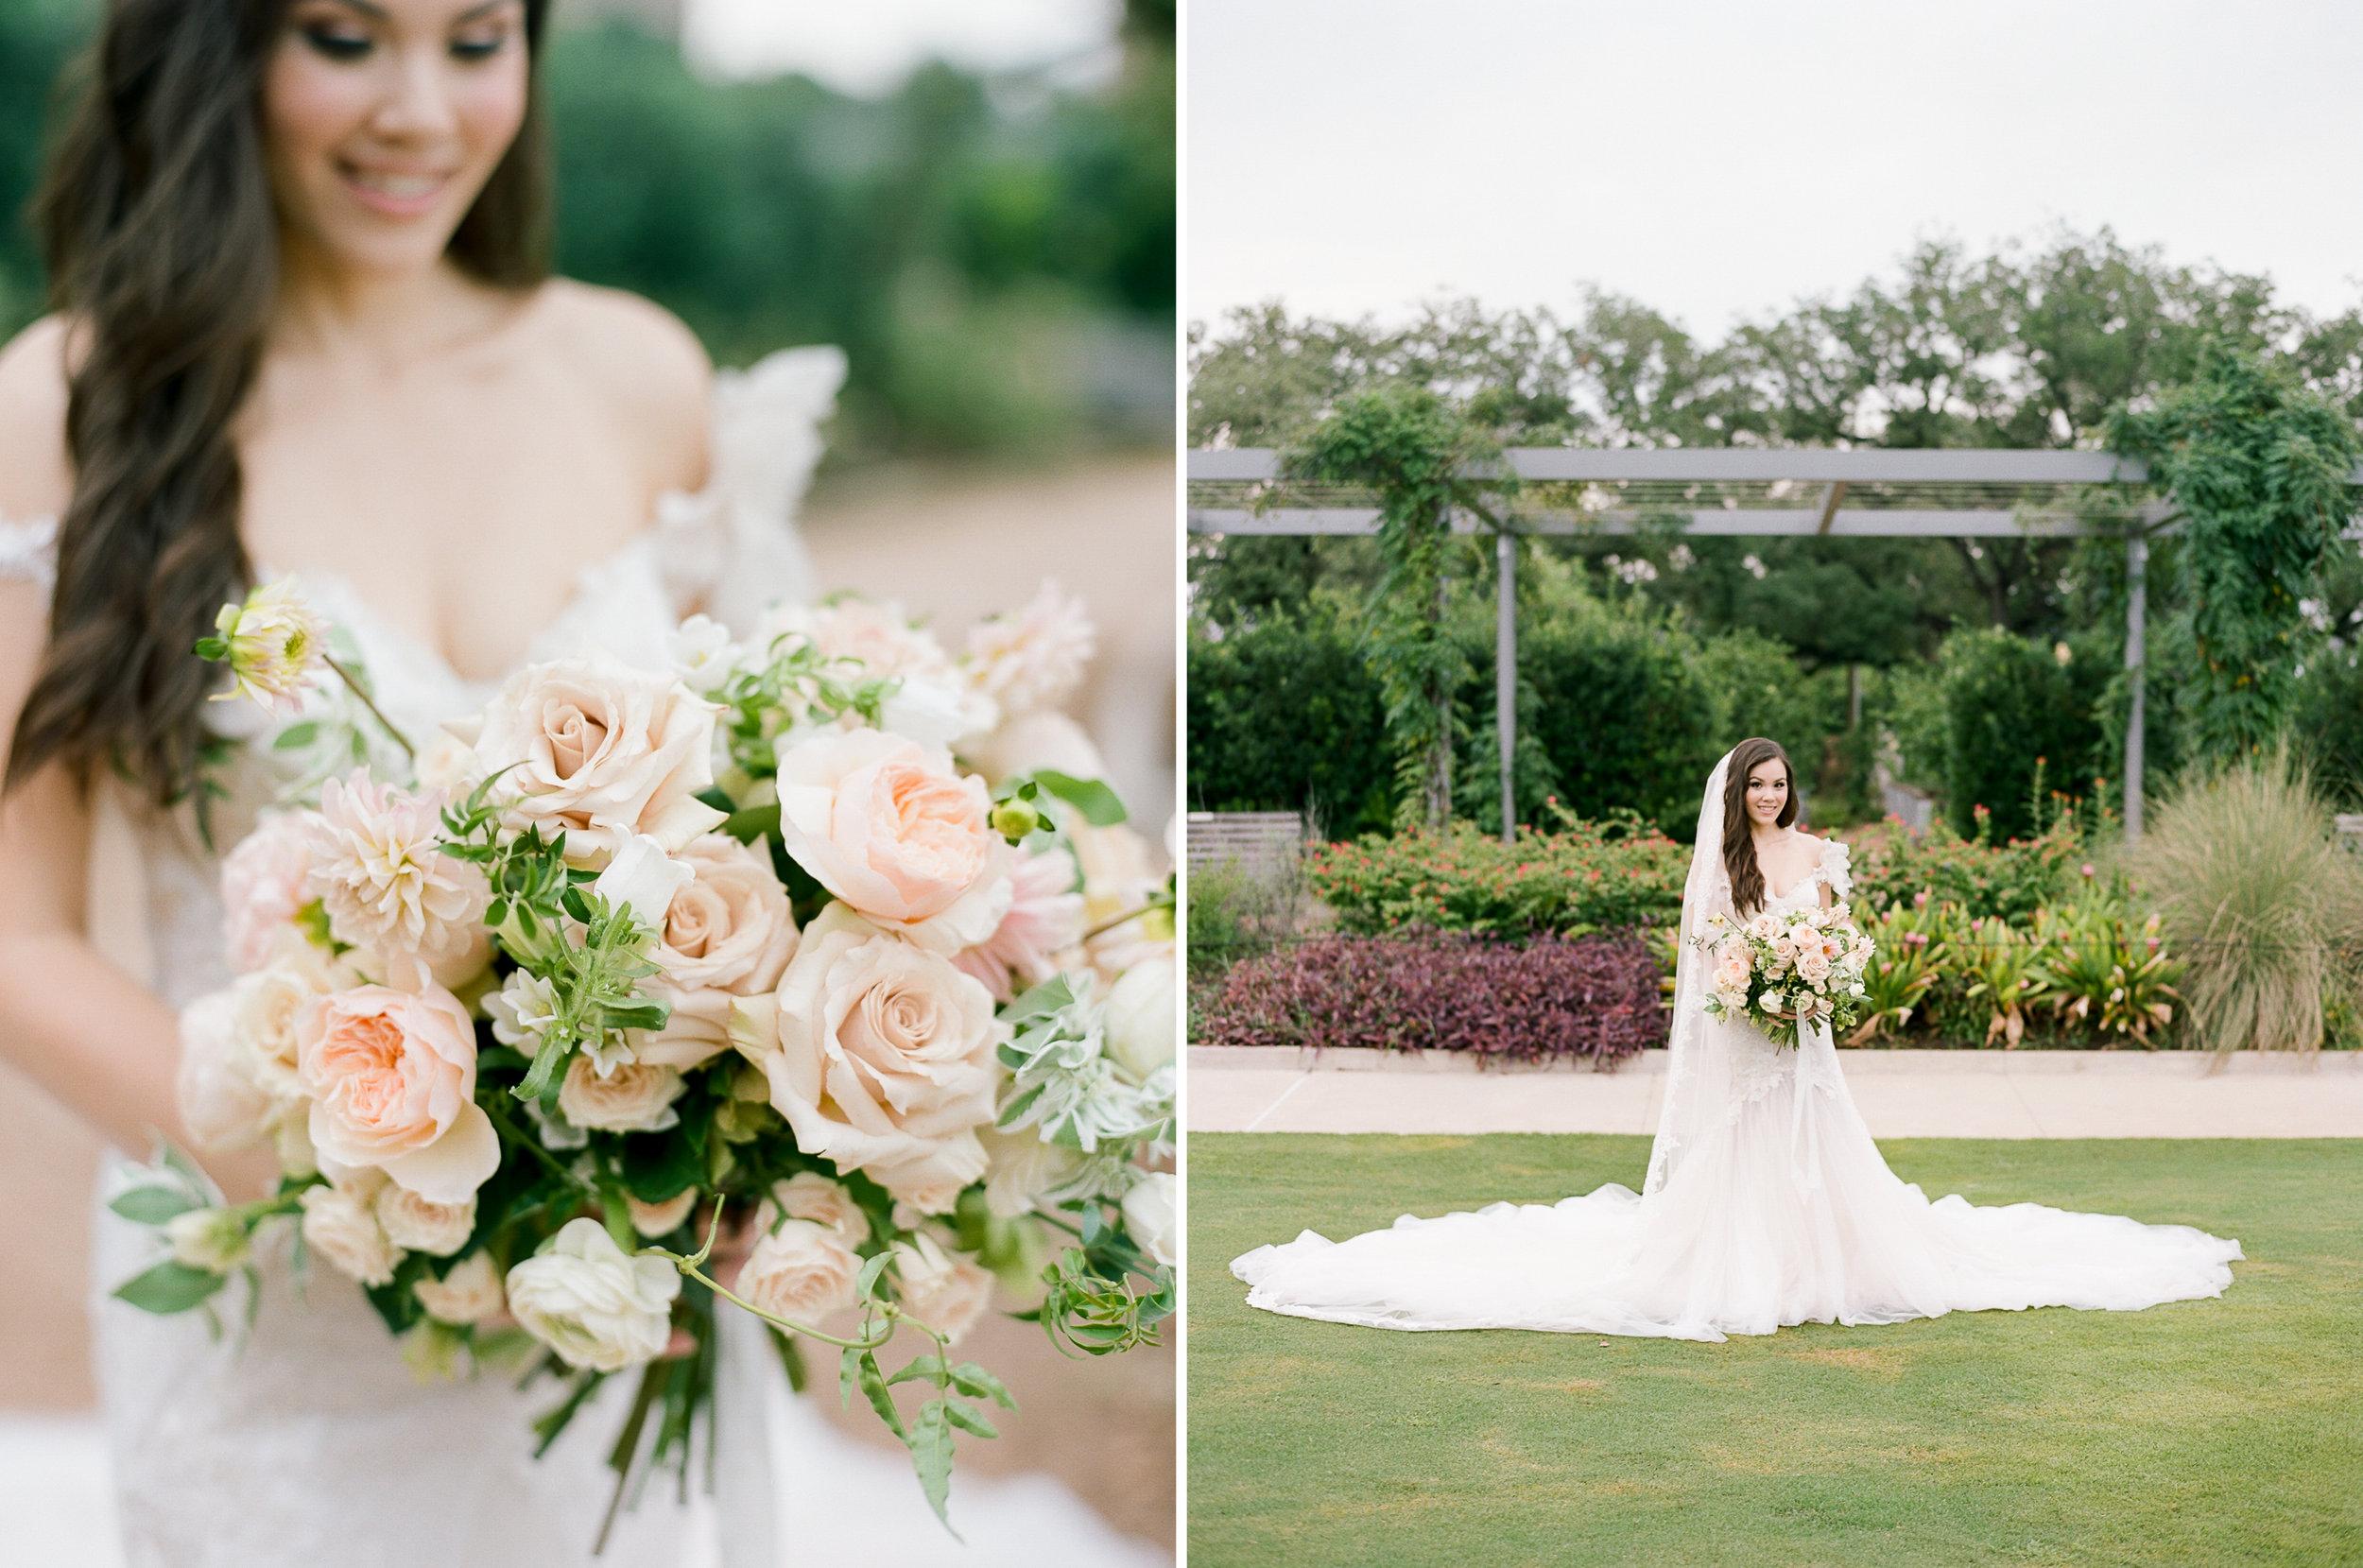 Fine-Art-Film-Houston-Wedding-Photographer-Best-Top-Luxury-Texas-Austin-Dallas-Destination-Dana-Fernandez-Photography-Portrait-Bridals-McGovern-Centennial-Gardens-104.jpg